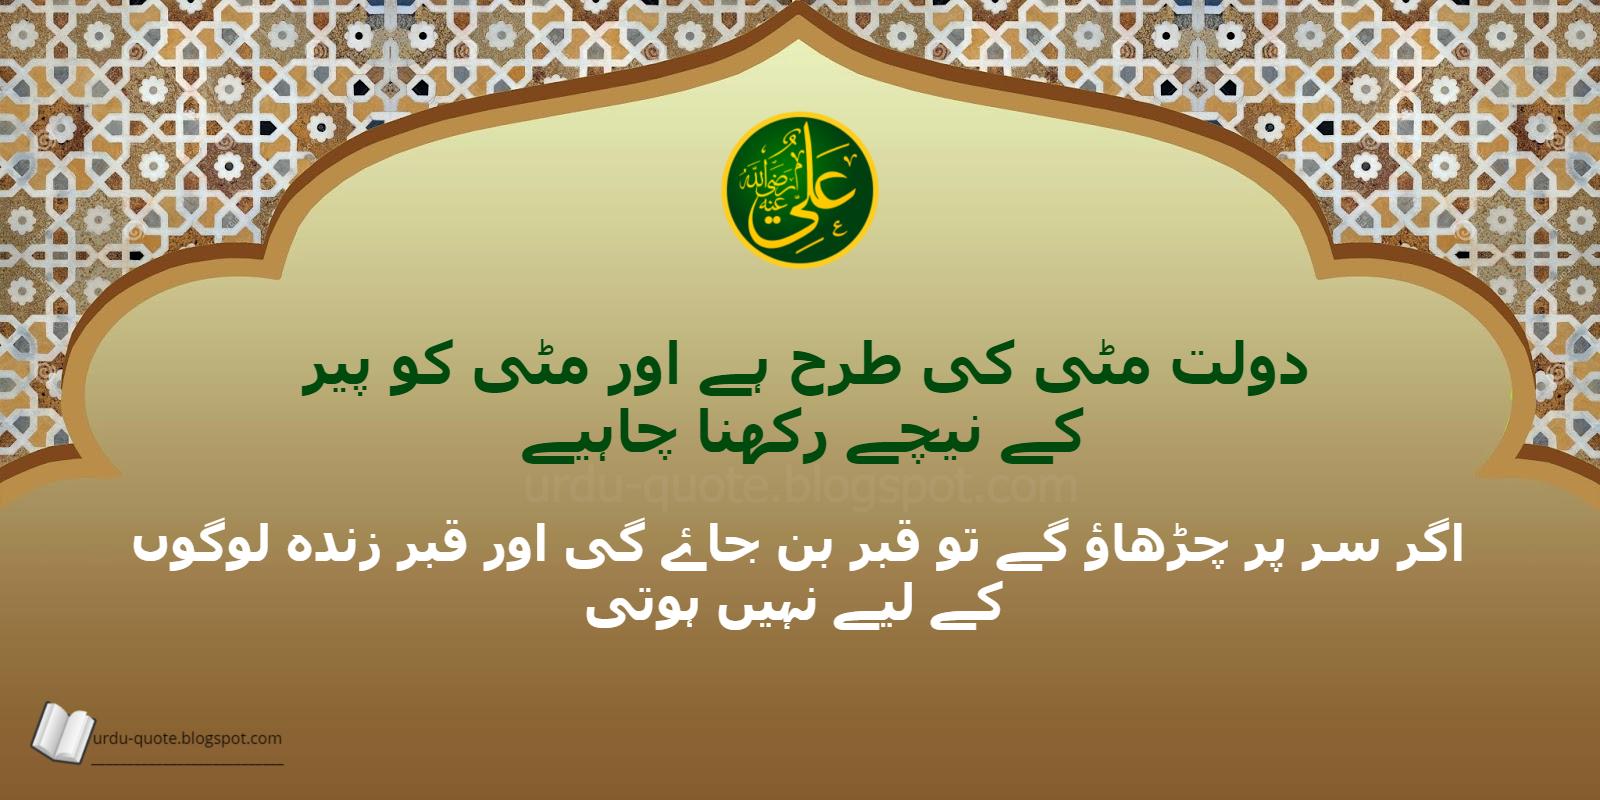 Imam Ali Quotes On Wife In Urdu • Opzetzwembadshop nl